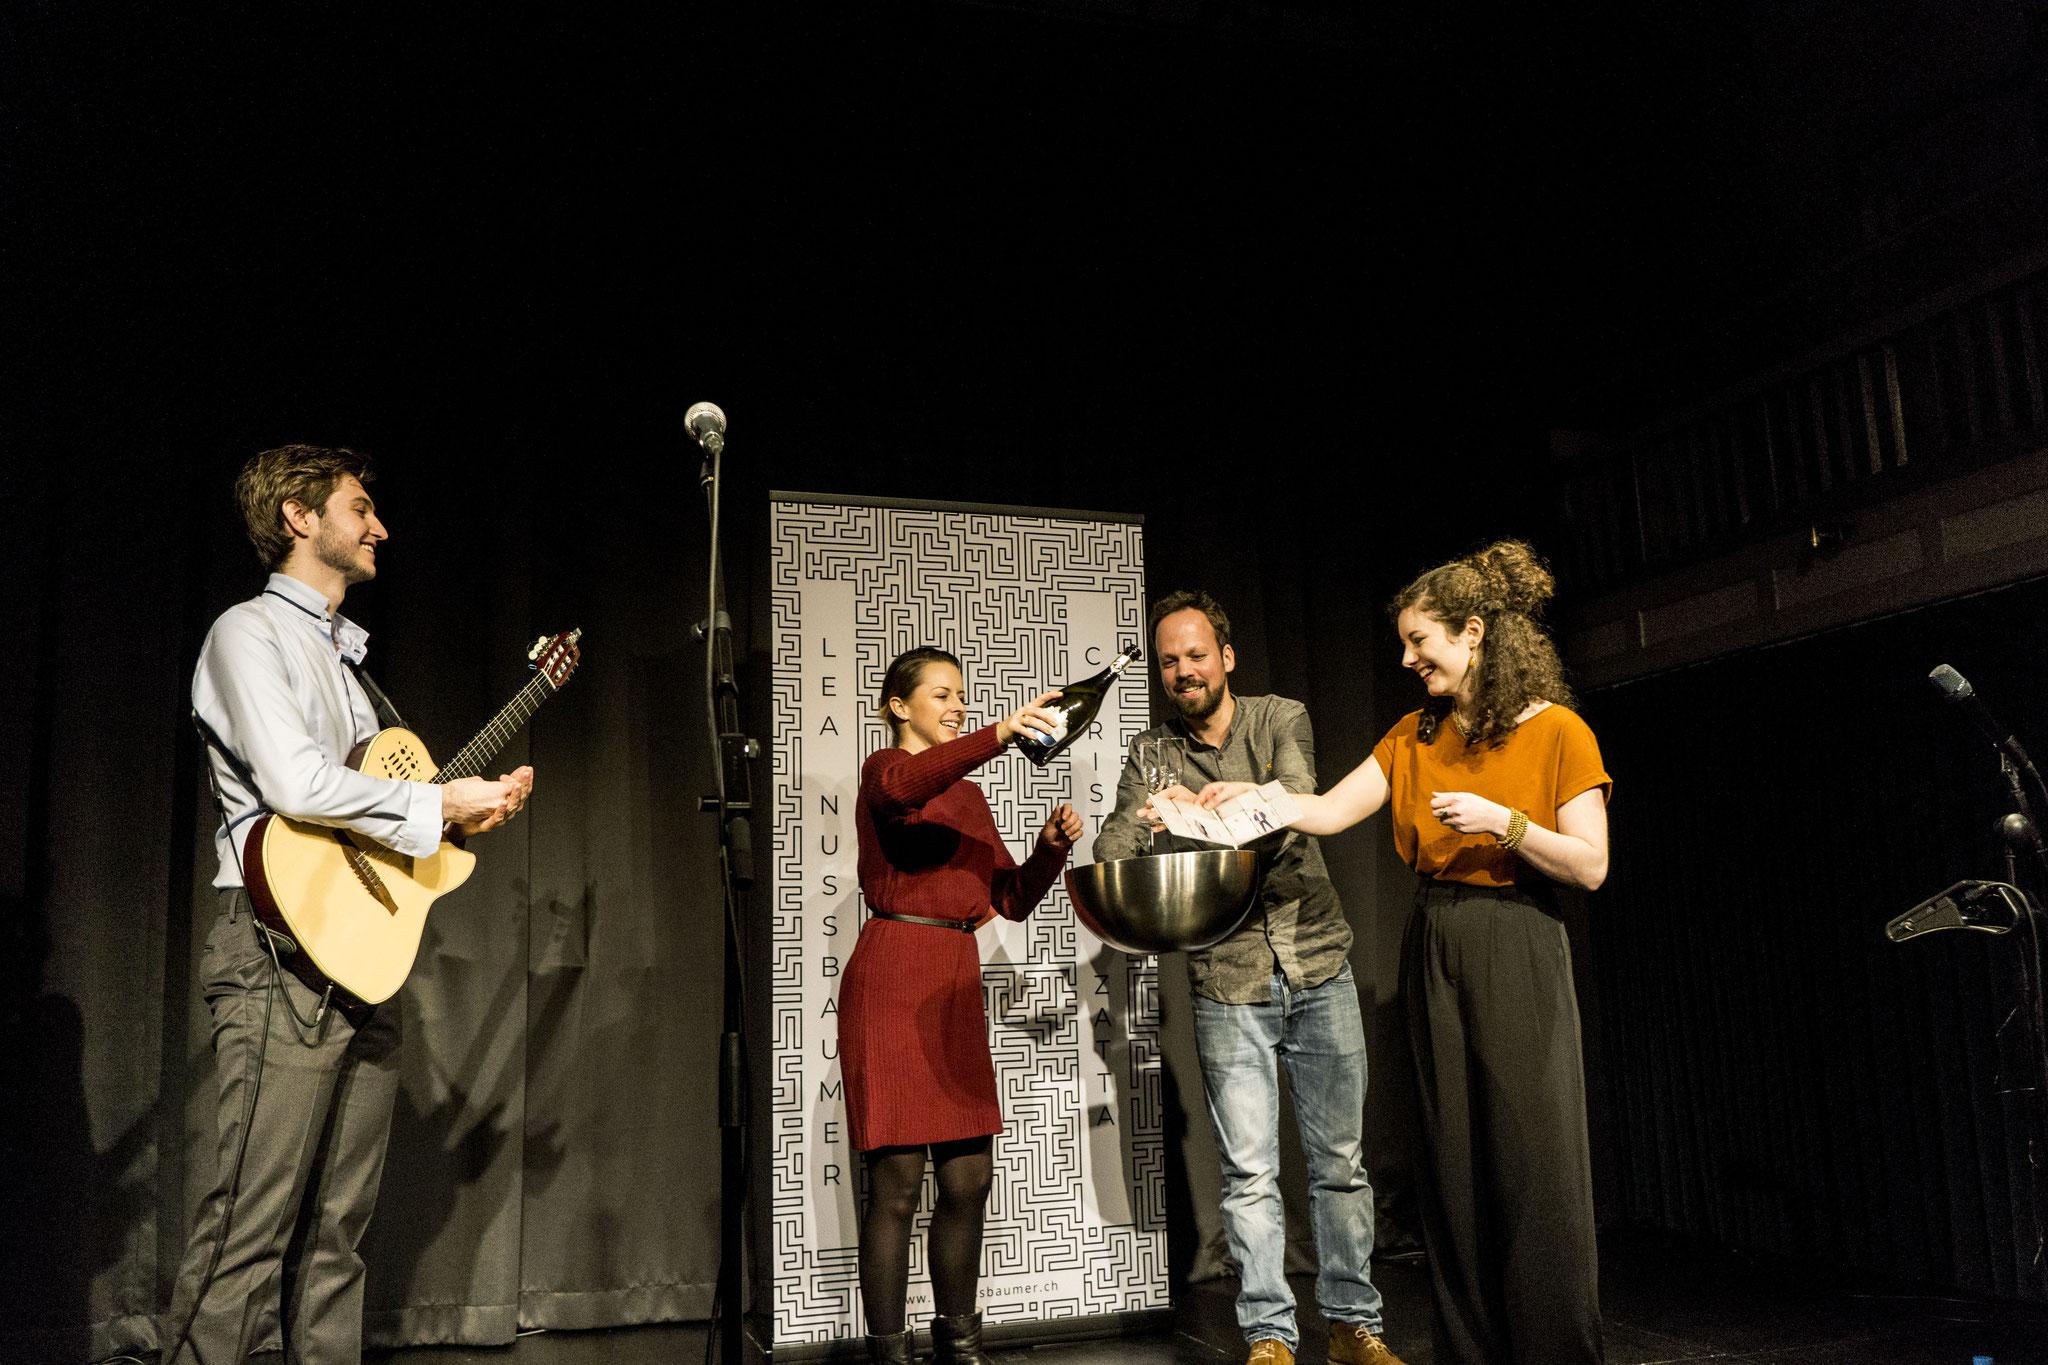 Plattentaufe, La Cappella Bern, 27.12.2018